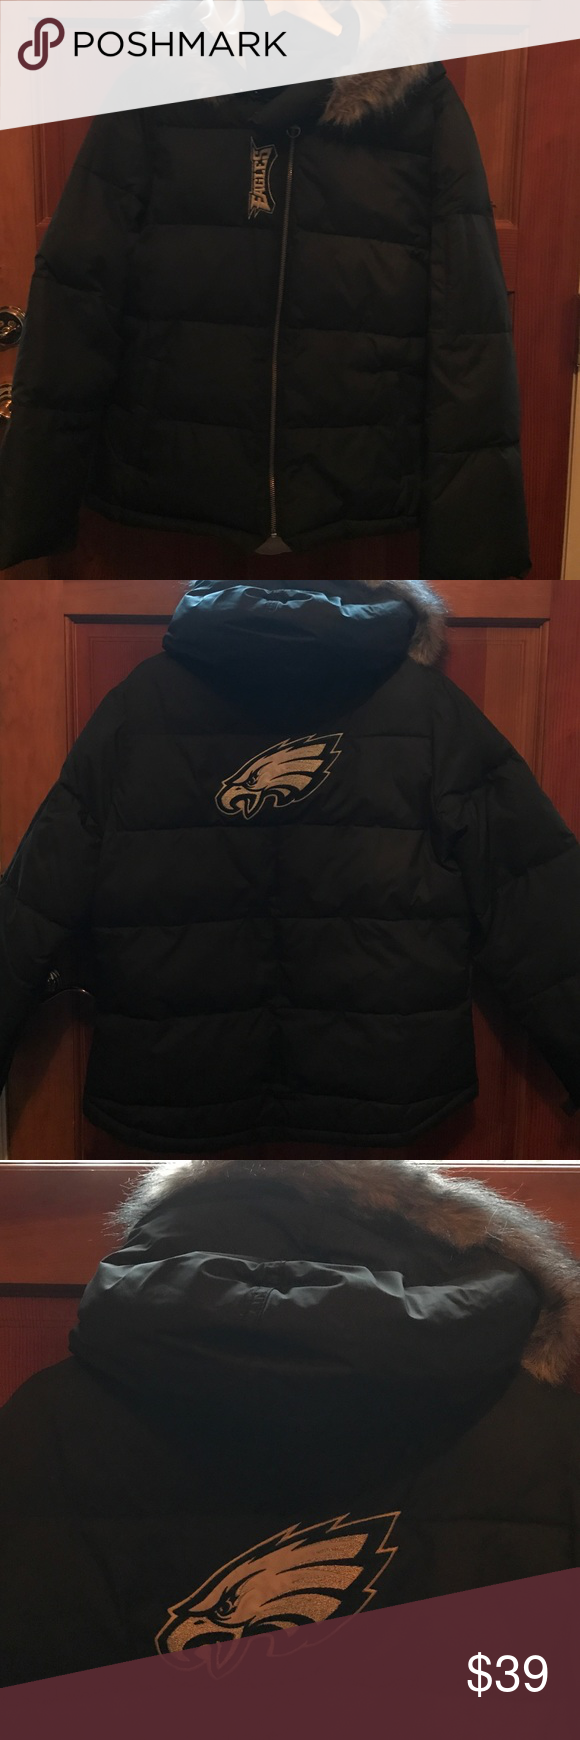 Reebok Women S Sz Xl Black Puffer Jacket Eagles Black Puffer Jacket Reebok Women Puffer Jackets [ 1740 x 580 Pixel ]